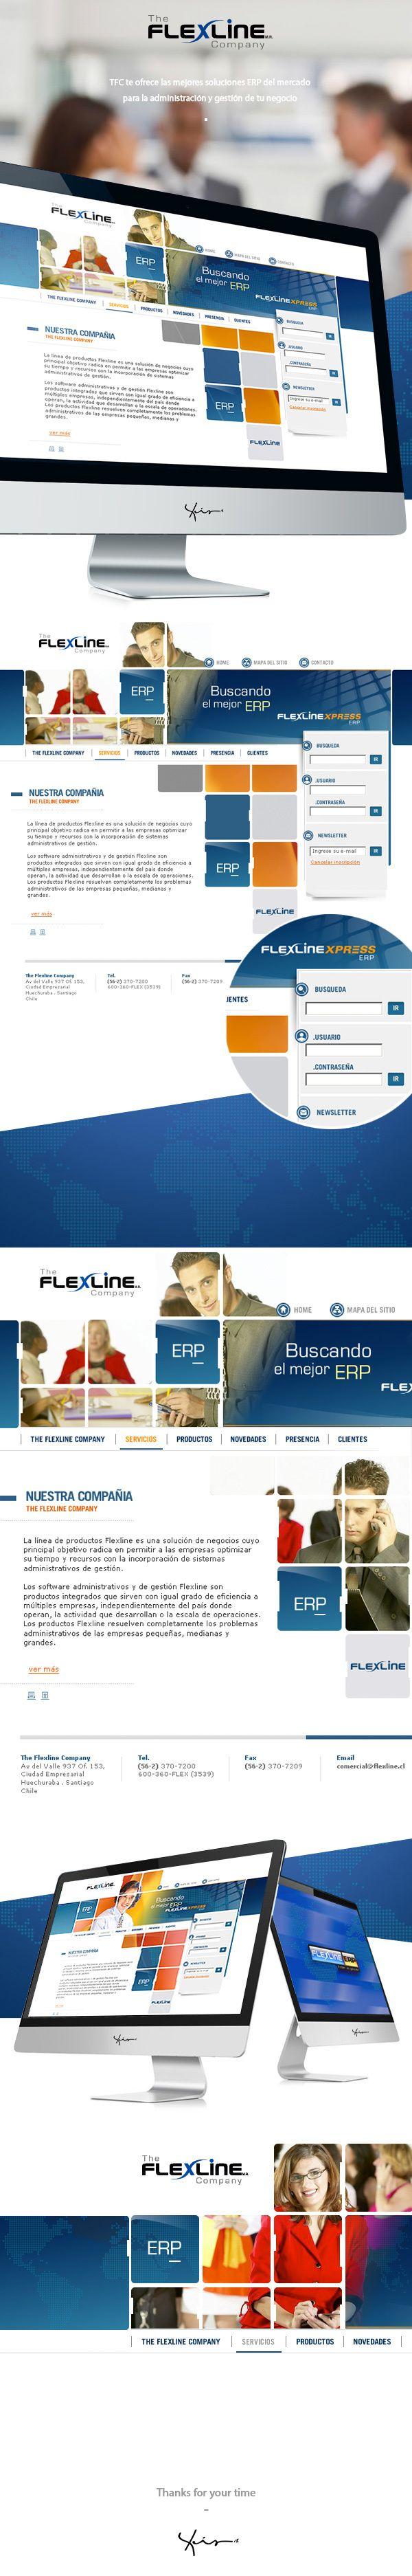 The Flexline Company by Lhuis, via Behance